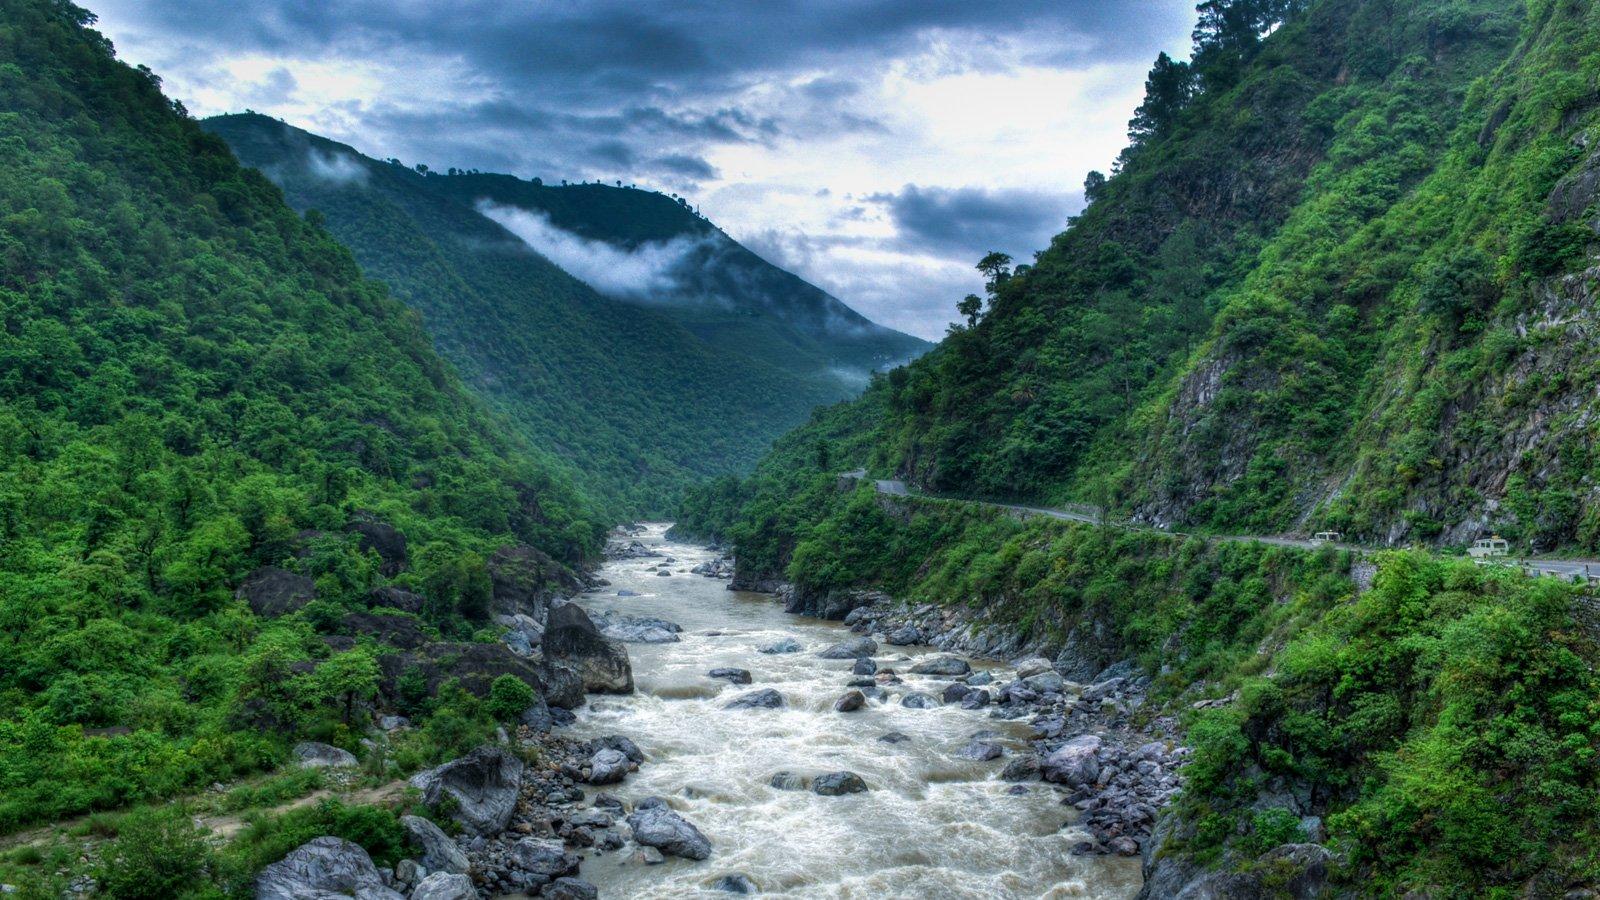 Haldwani Image